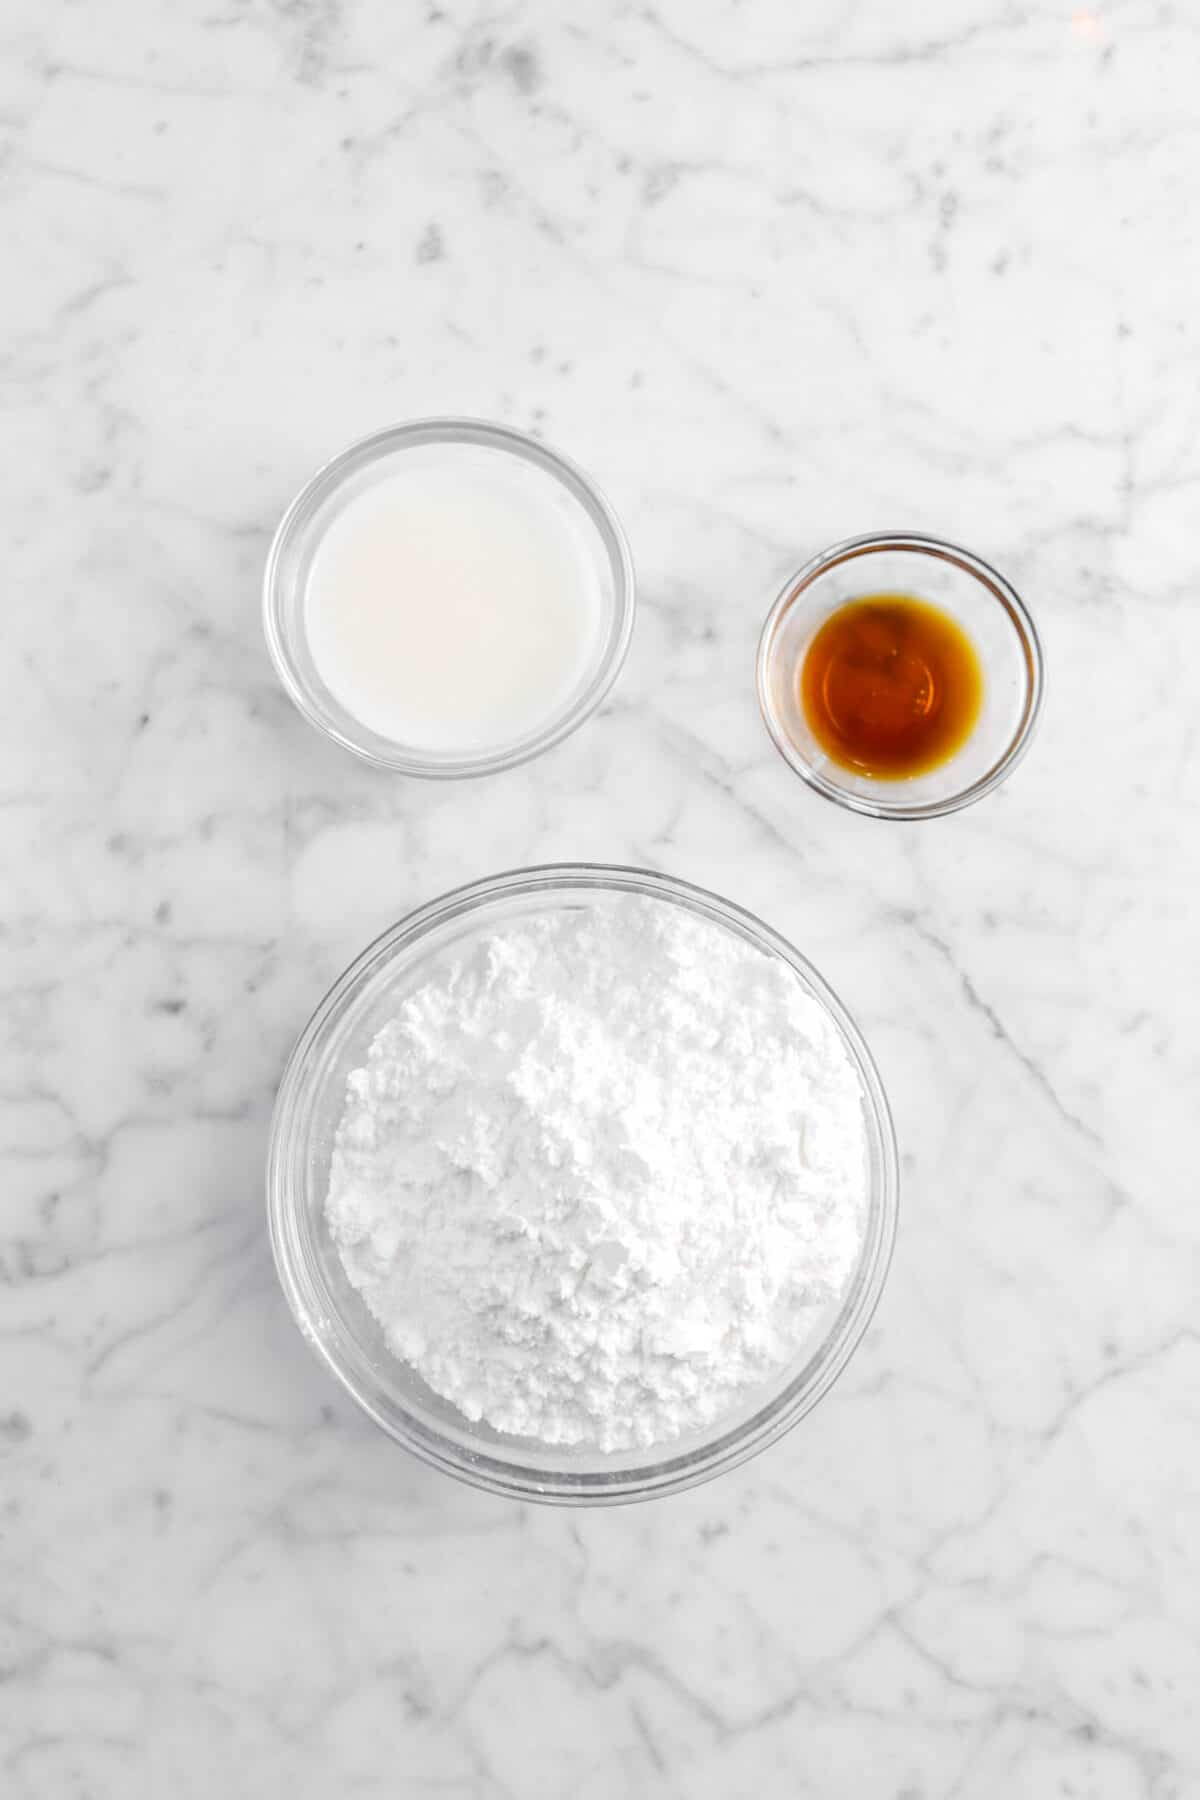 powdered sugar, vanilla, and milk on marble counter